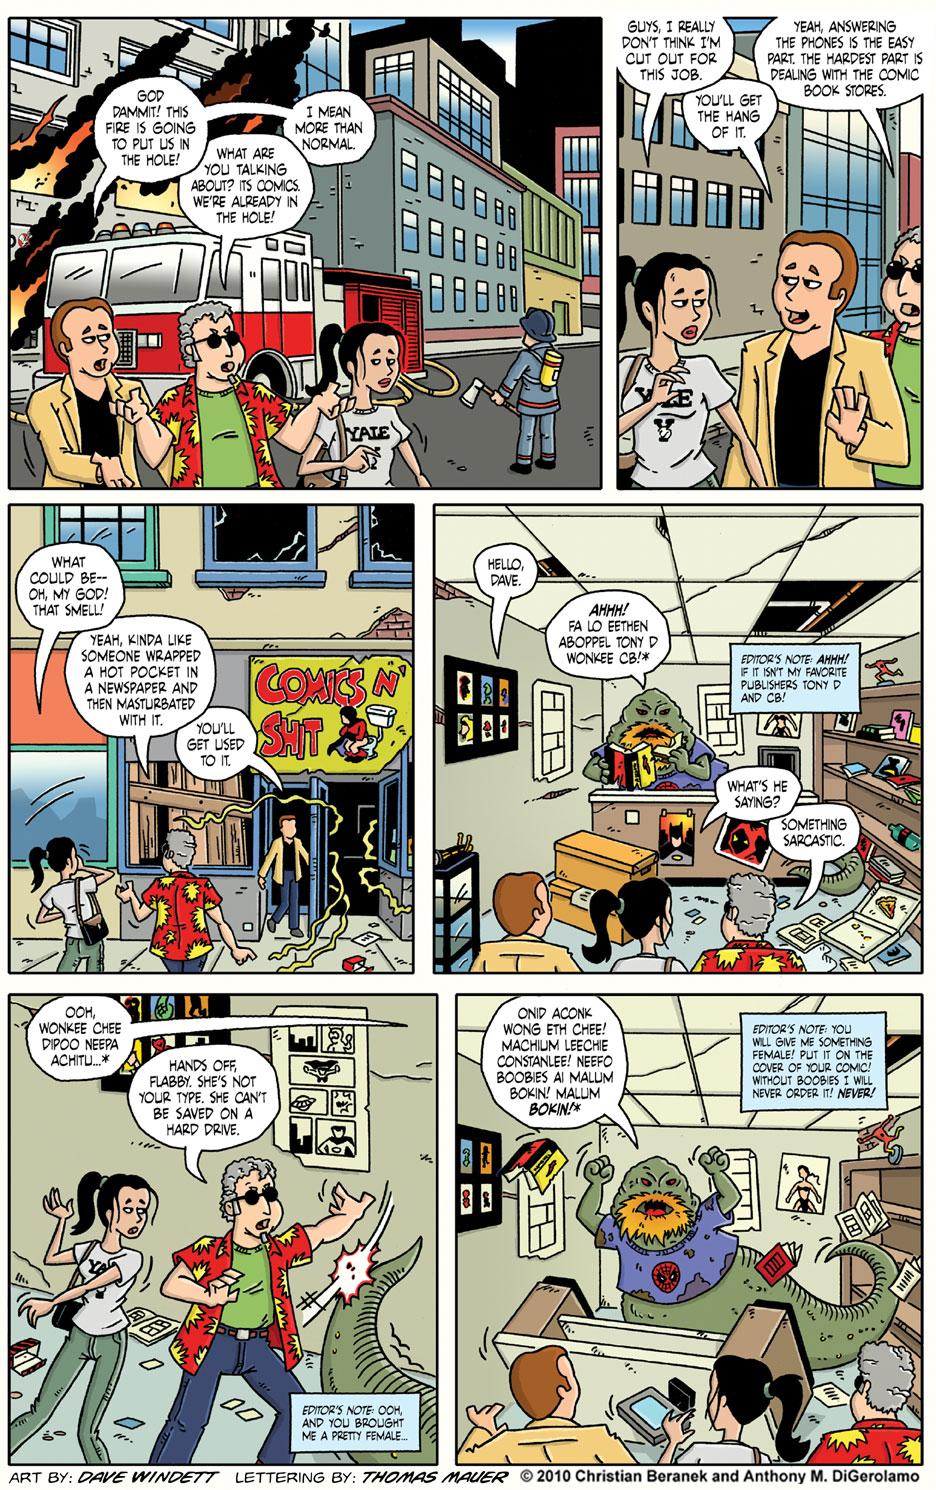 Comic Book Mafia #6: The Smell of Comics